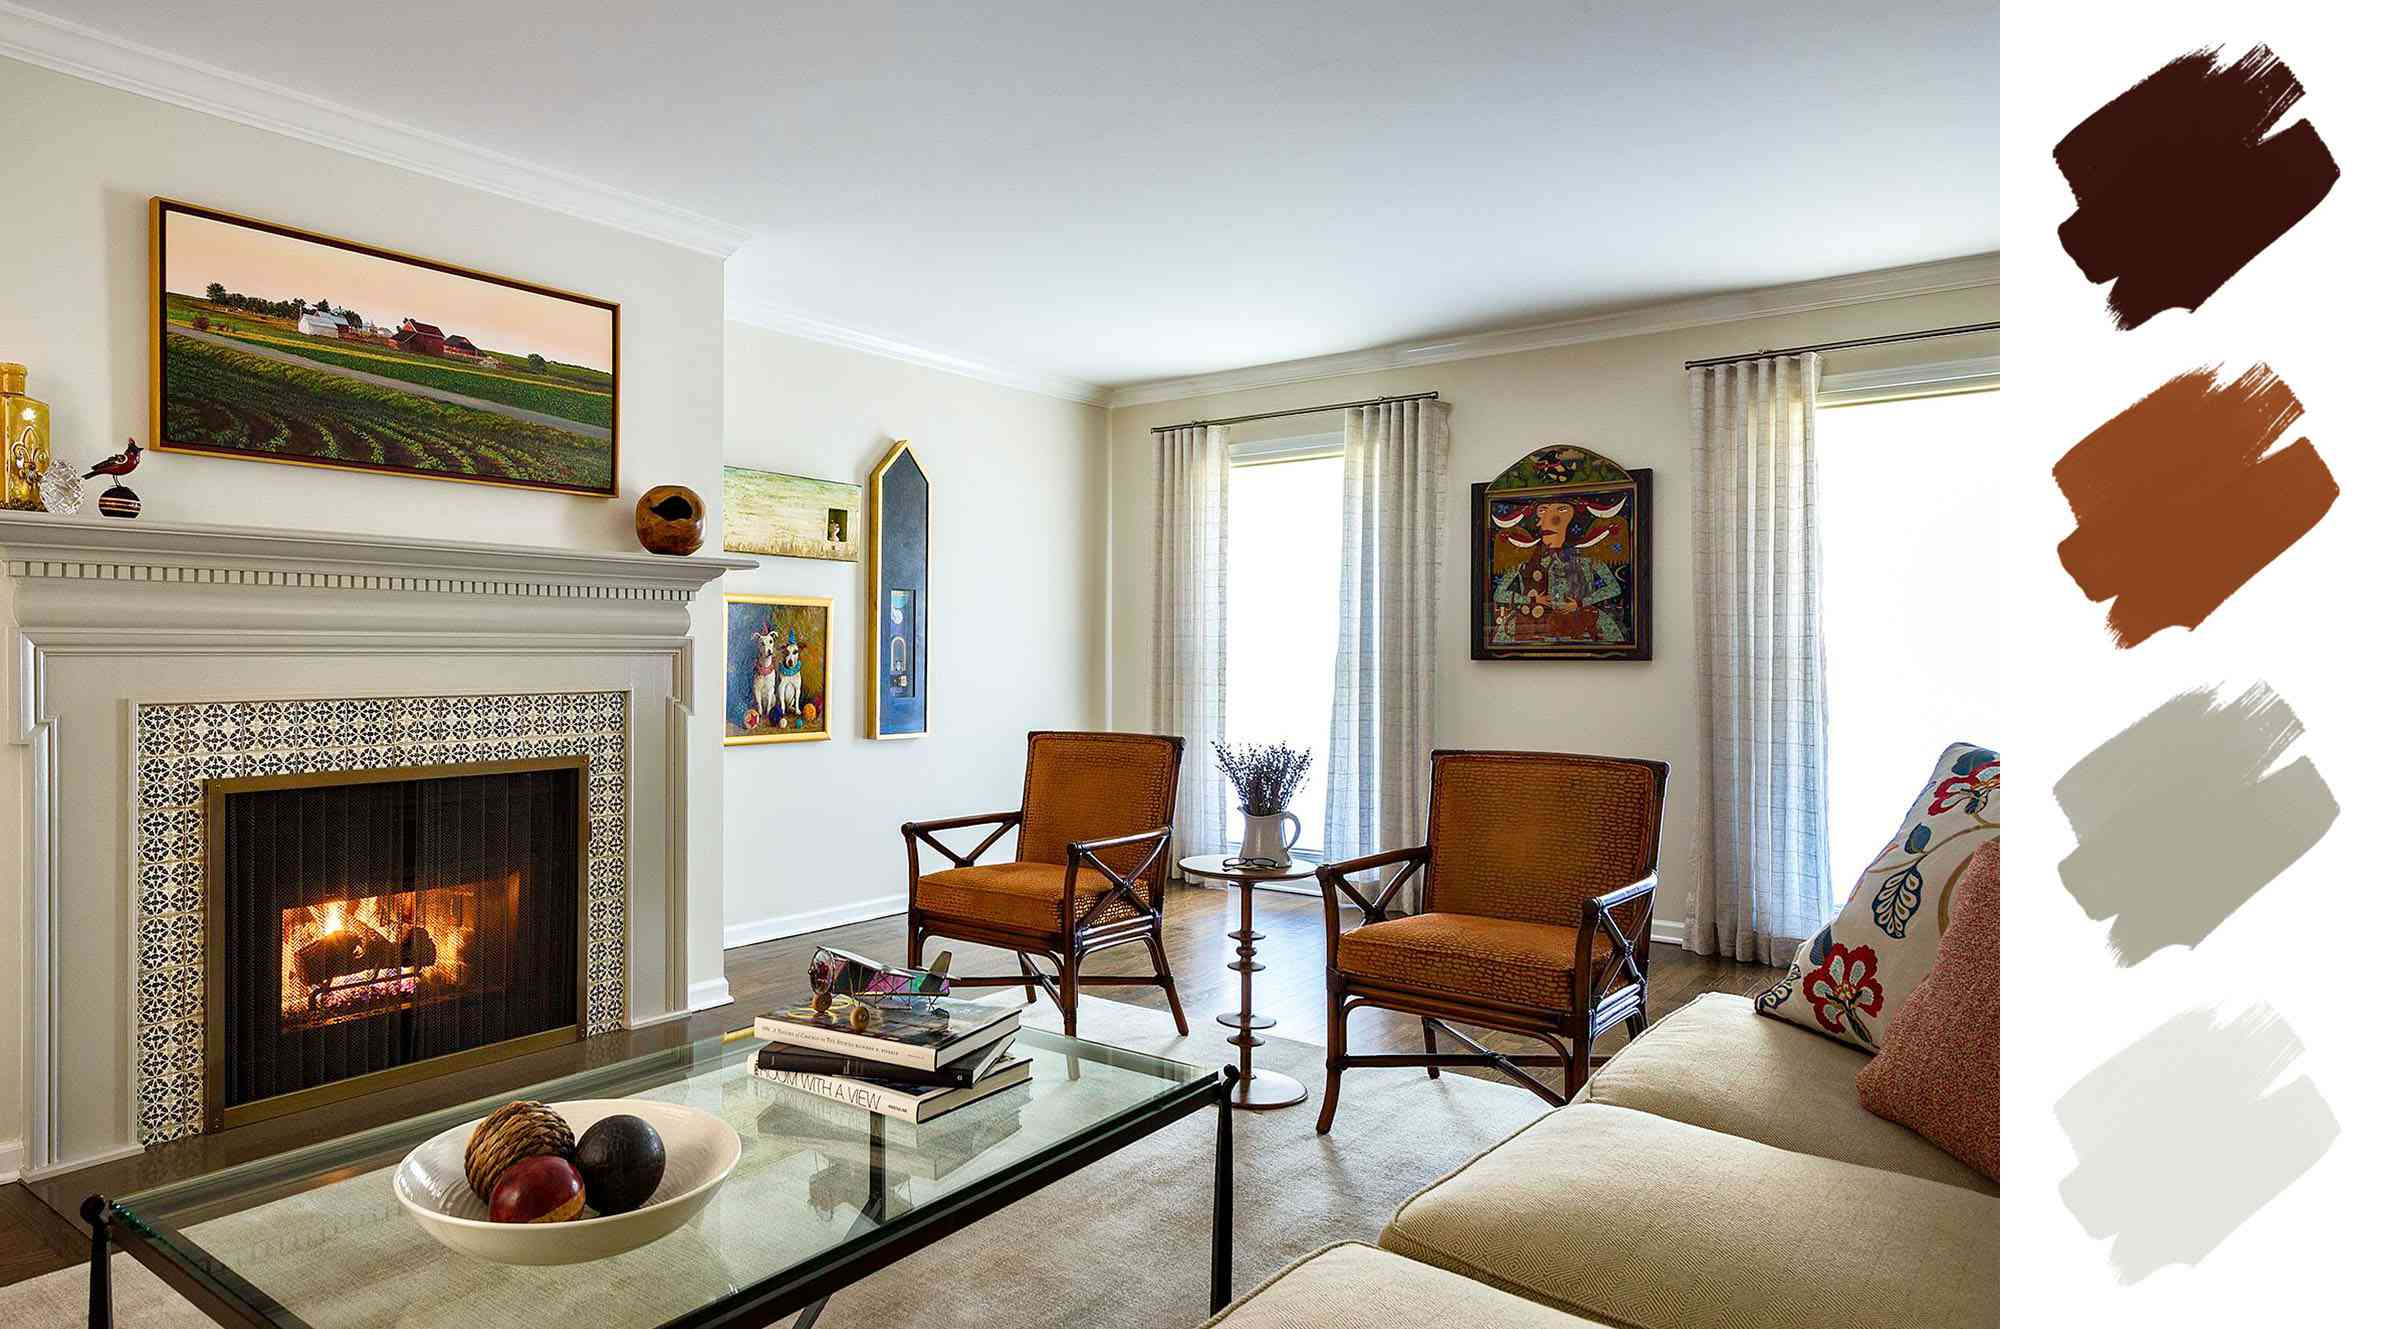 best home color schemes - umber and greige living room